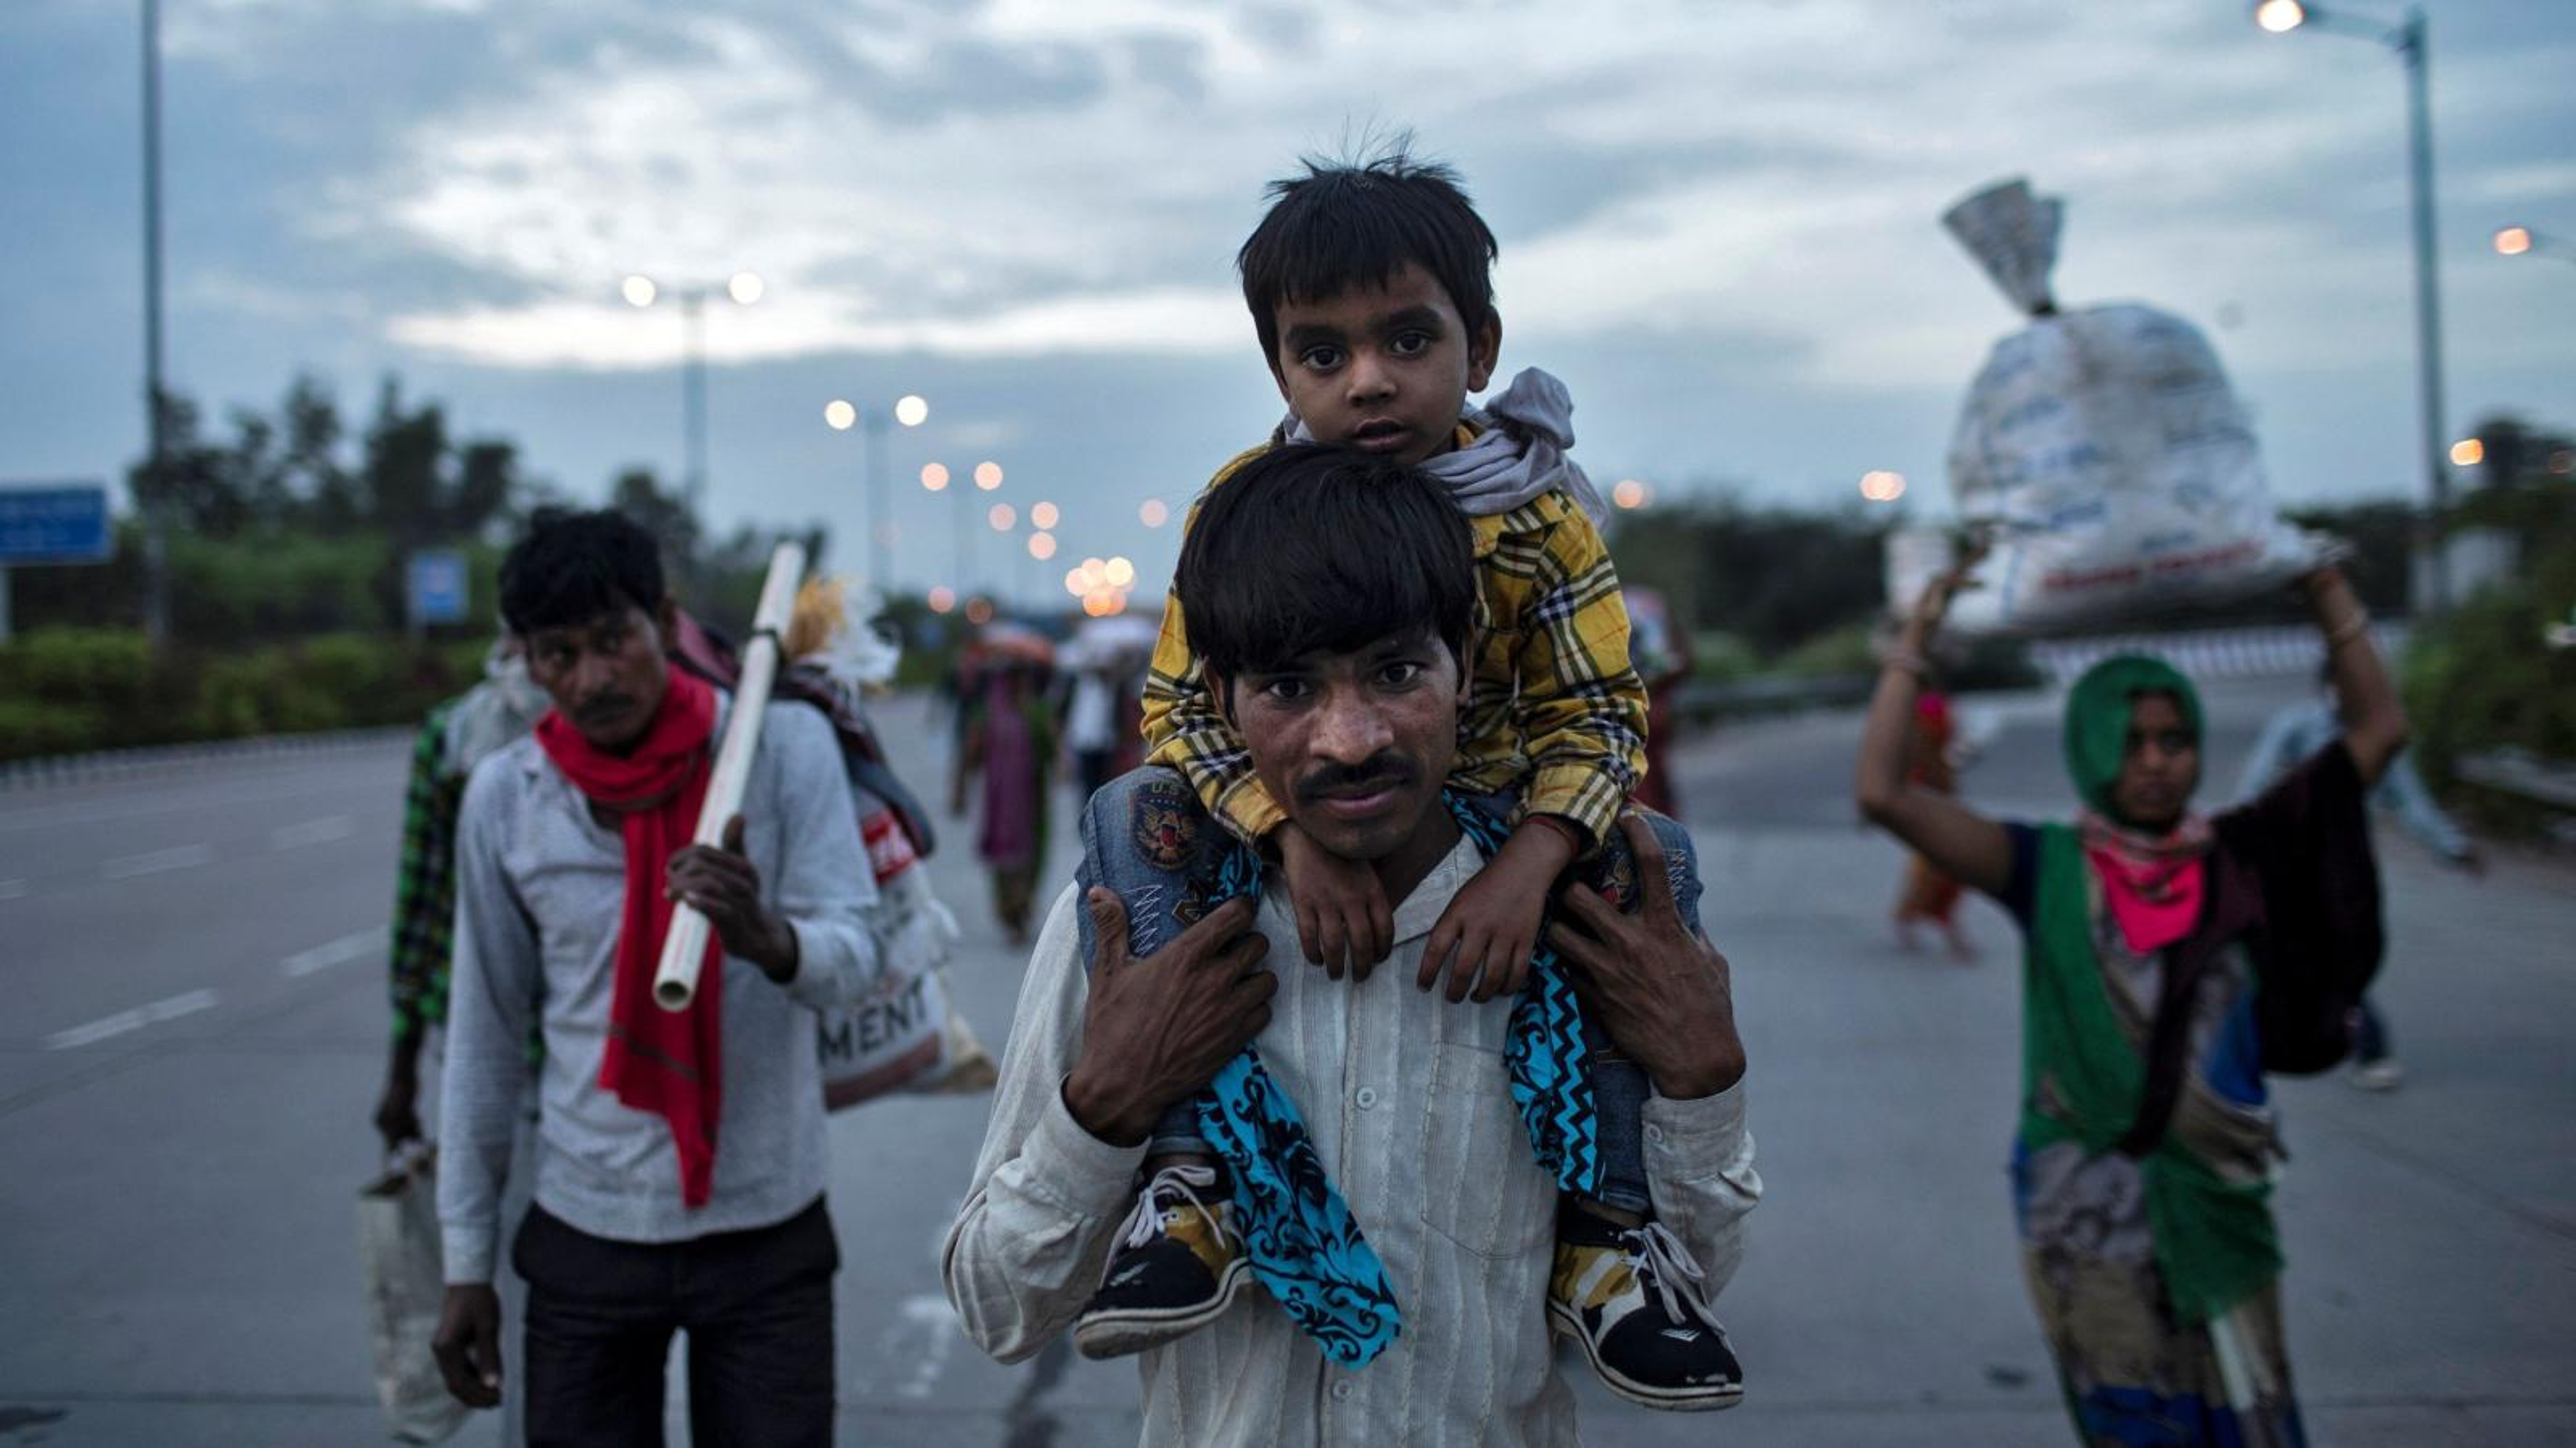 India's coronavirus lockdown has triggered mass migration on foot ...